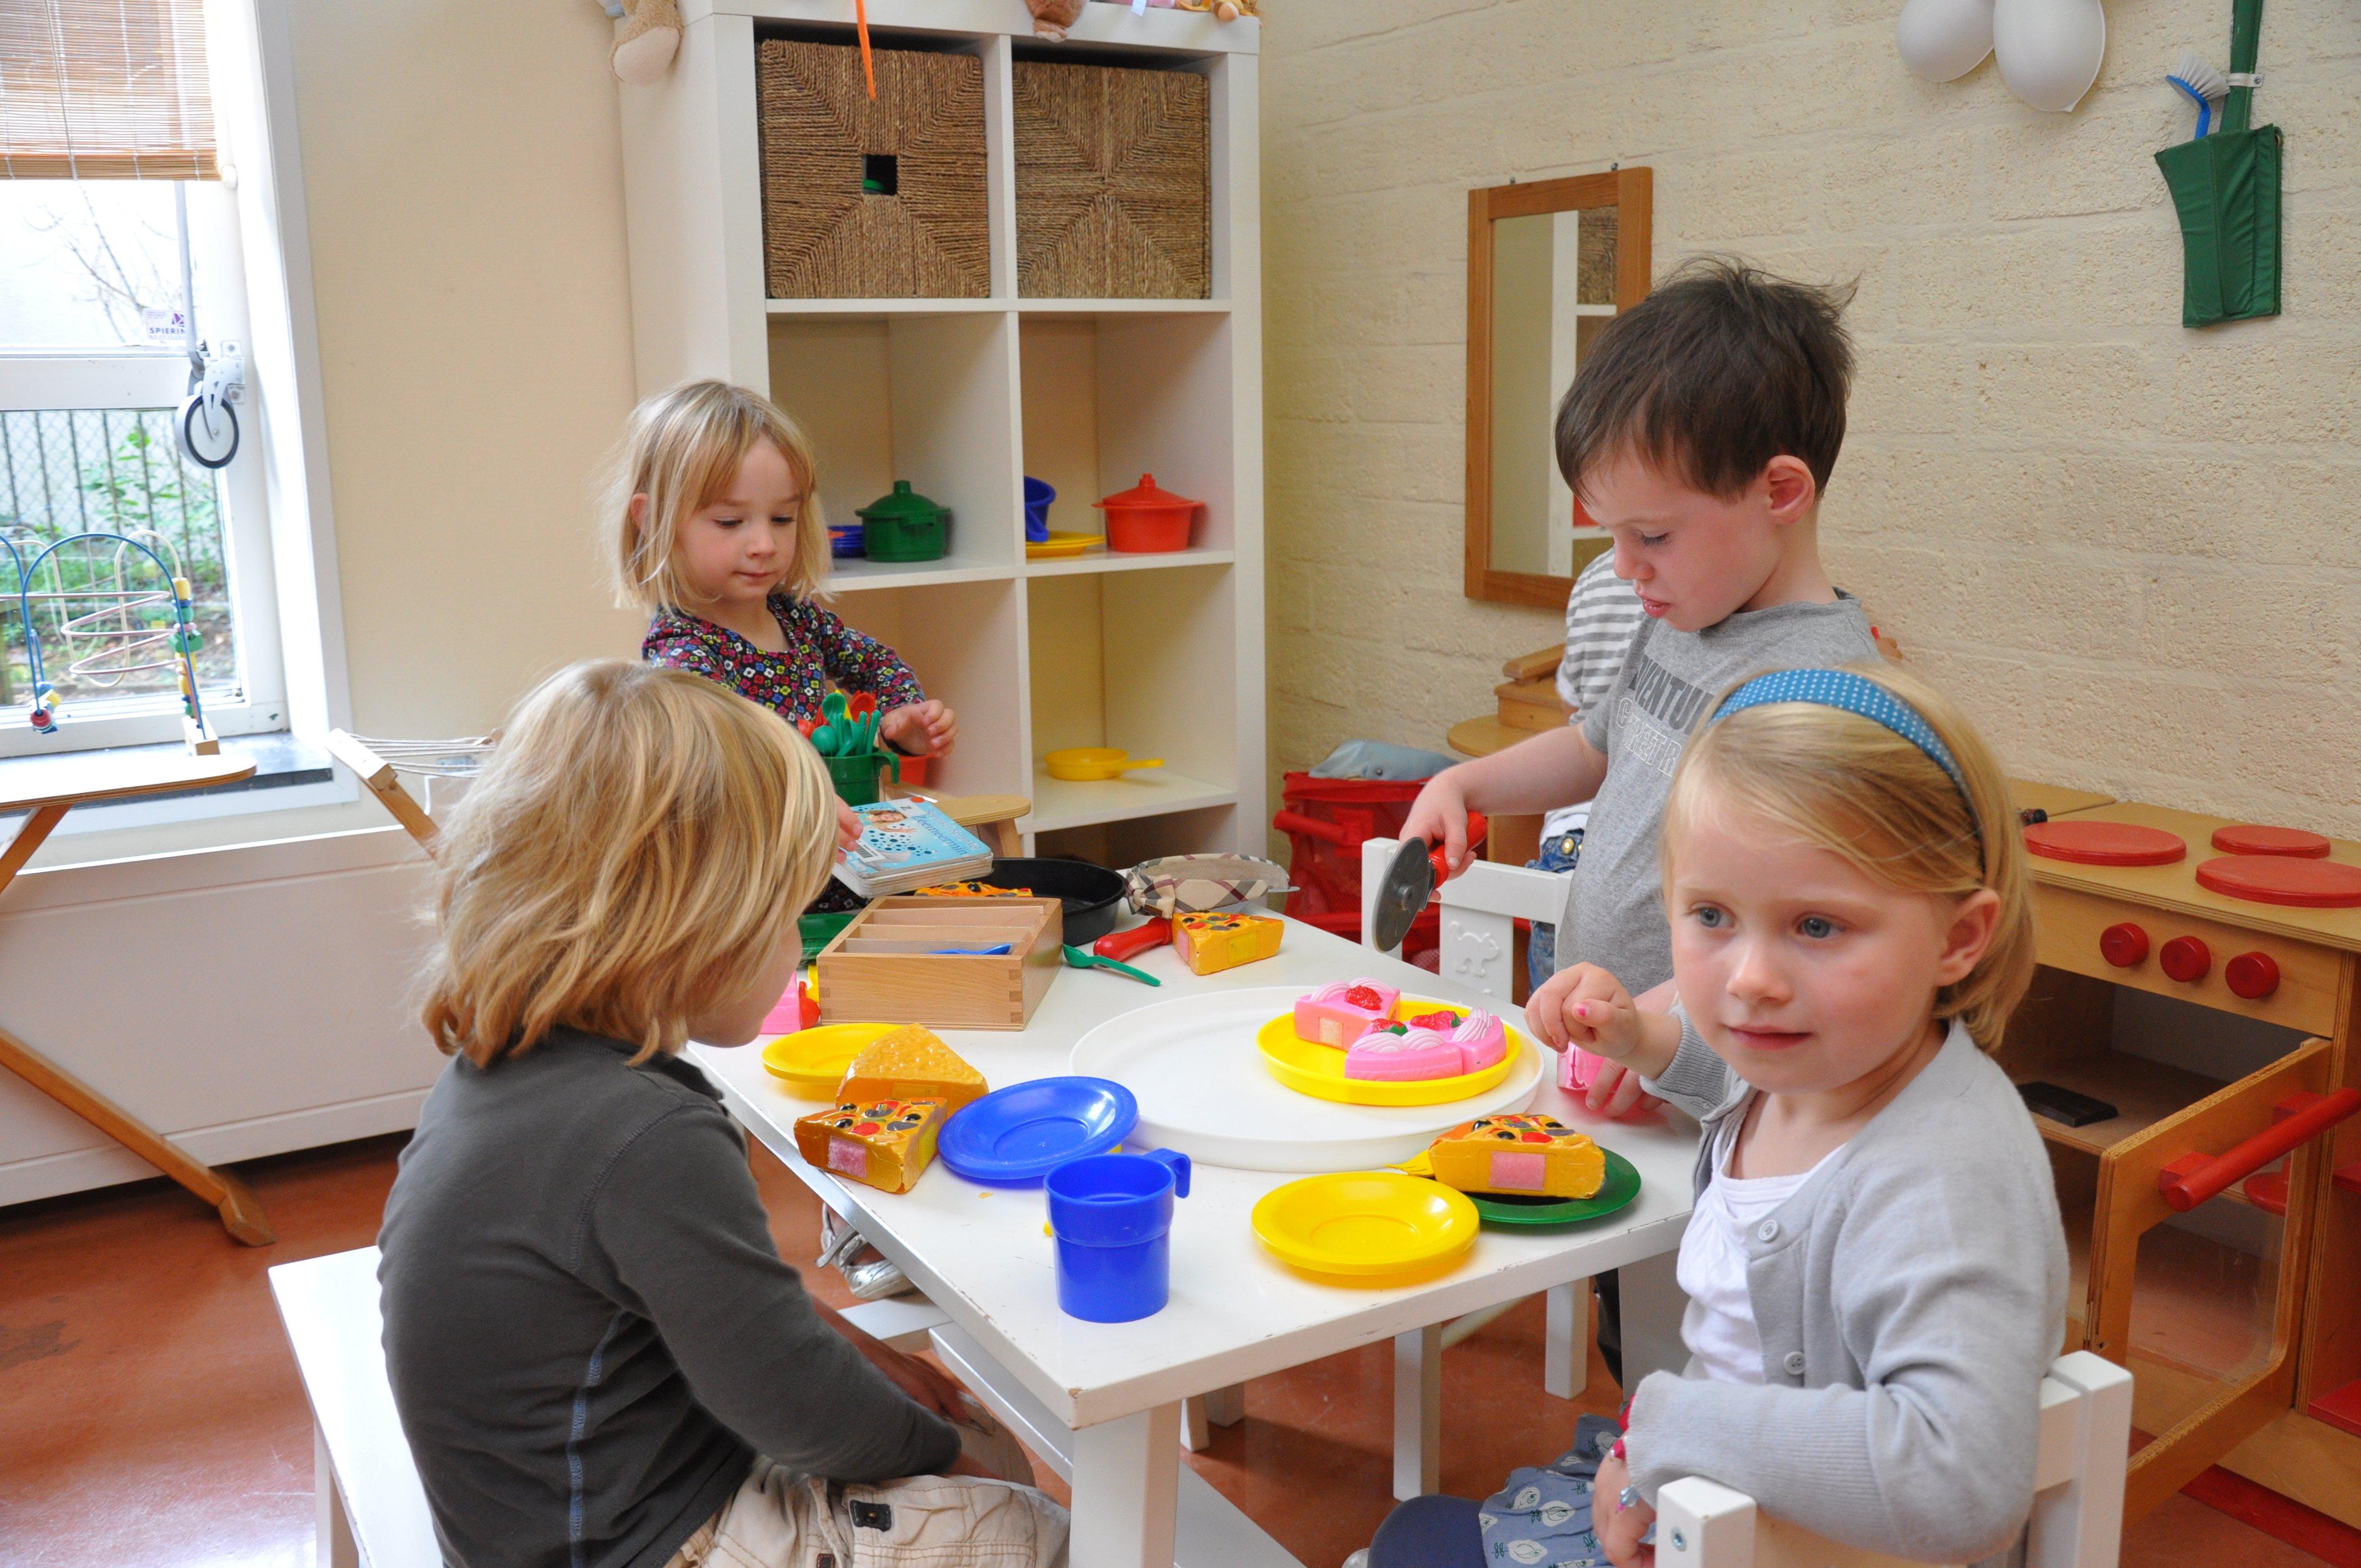 Stichting Kinderopvang Huizen : Stichting kinderopvang huizen ouderportaal home kinderopvang